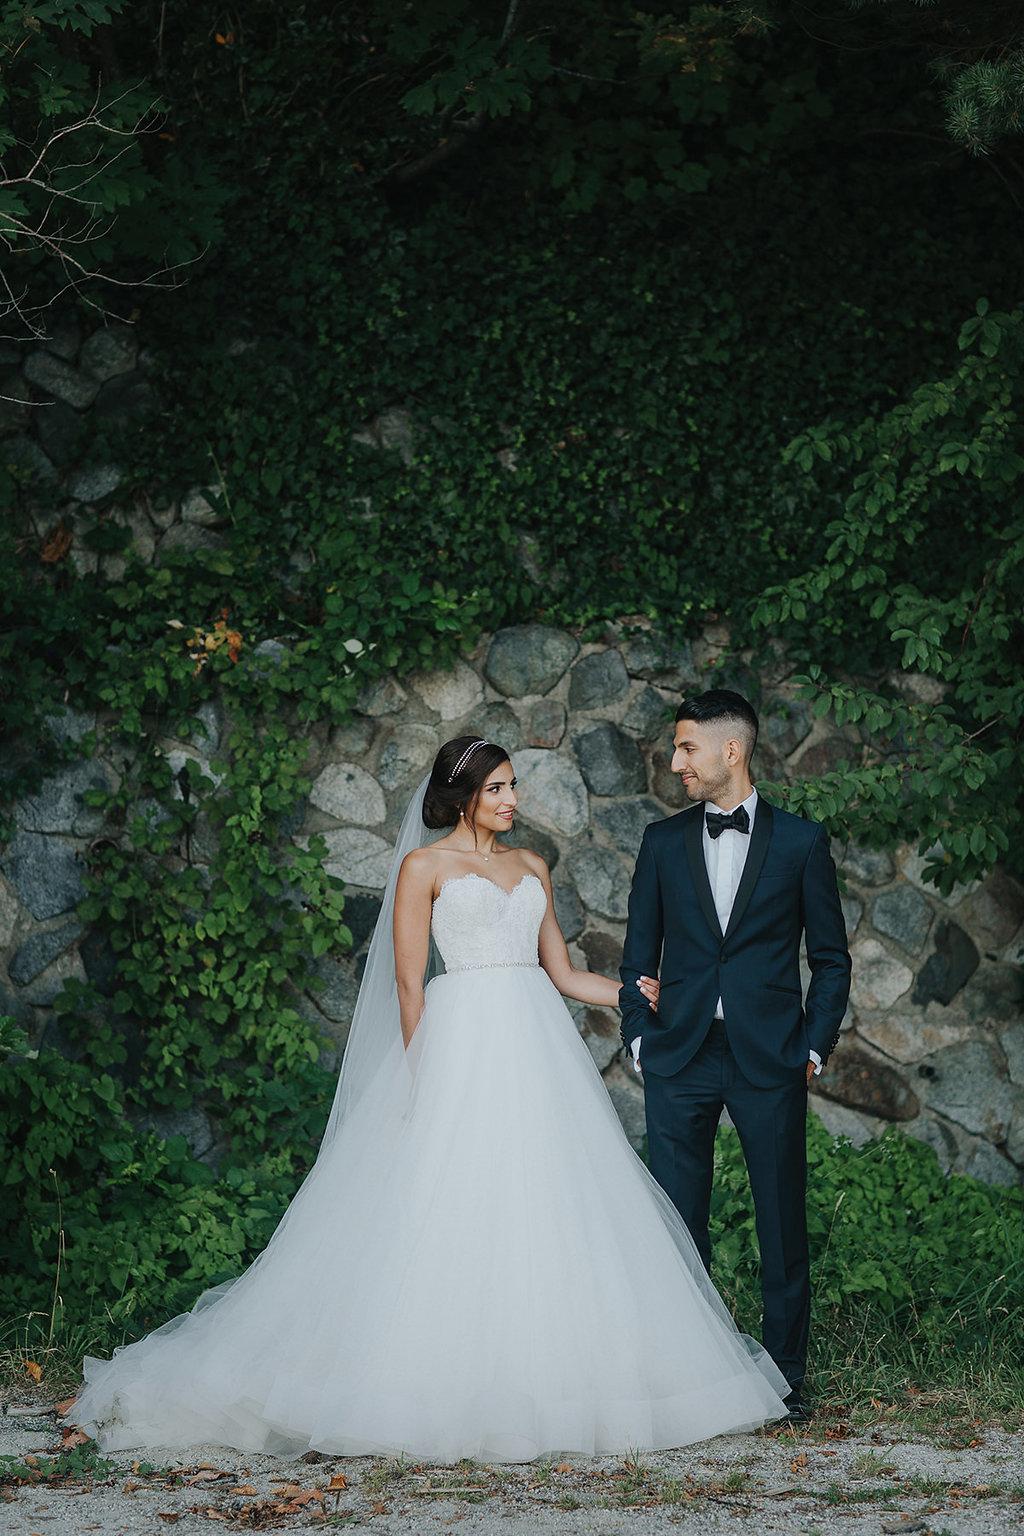 Elegant Canadian Wedding with Greenery - photo by Melia Lucida http://ruffledblog.com/elegant-canadian-wedding-with-greenery